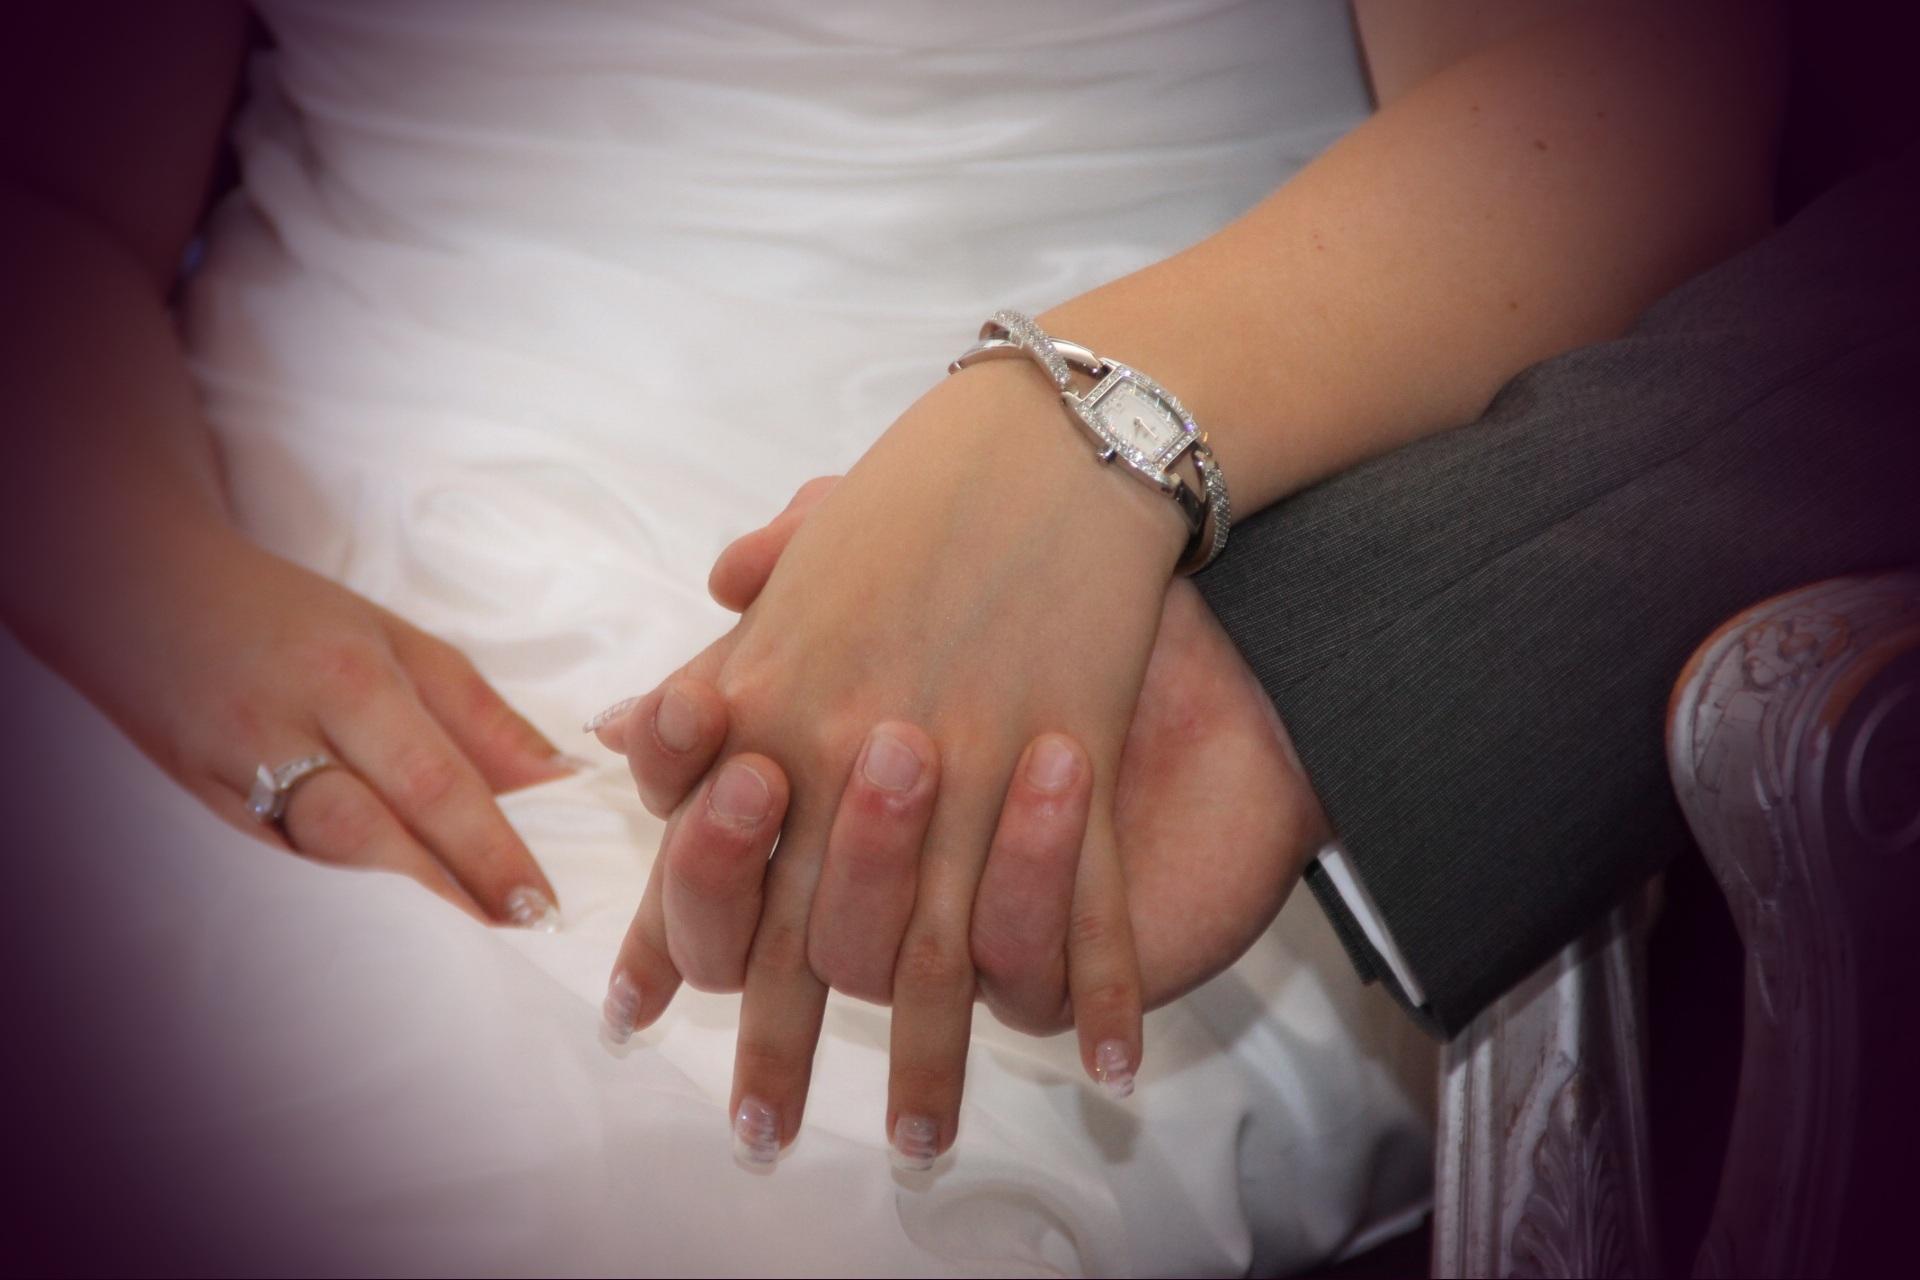 Free Images Hand Woman Leg Finger Together Arm Bride Groom